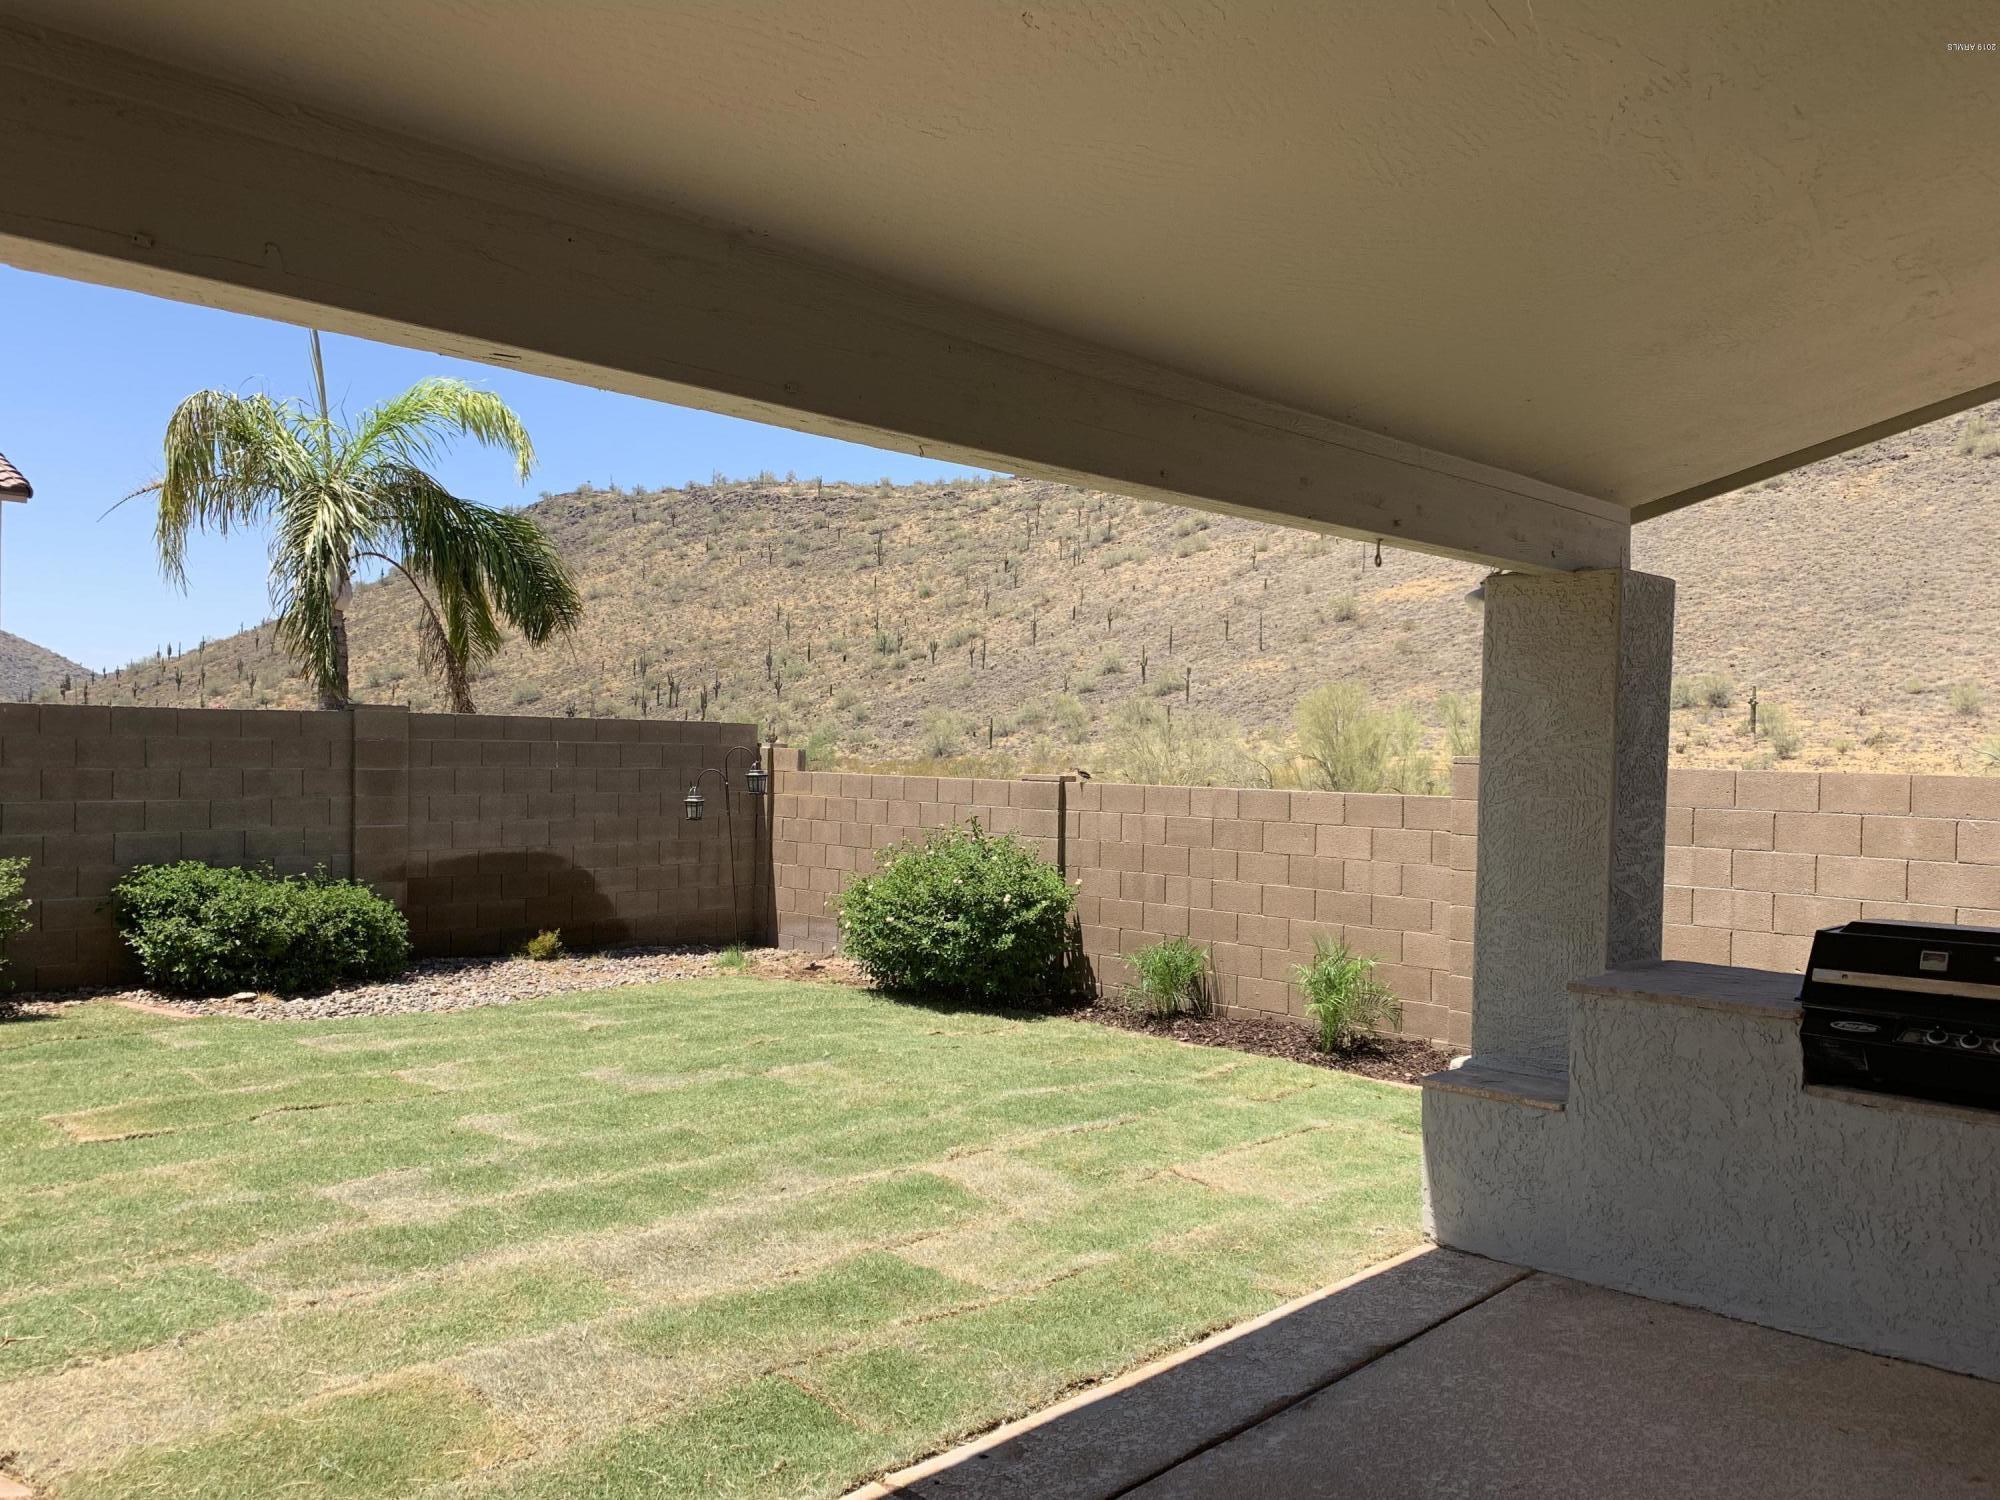 MLS 5886162 2003 E MARIPOSA GRANDE Street, Phoenix, AZ 85024 Phoenix AZ Mountaingate